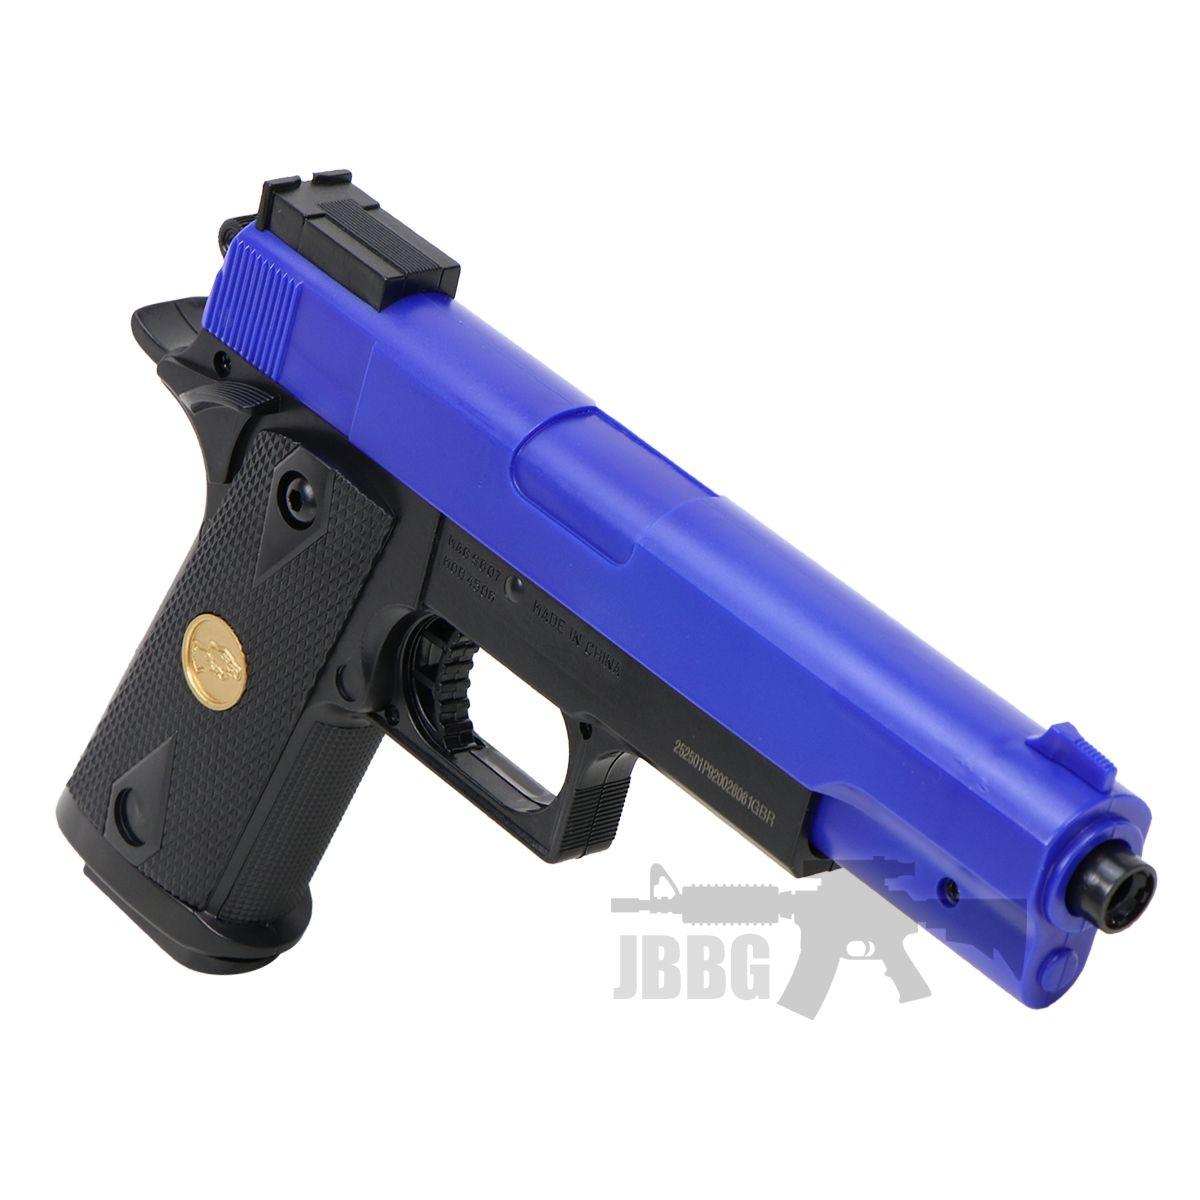 blue pistol bb jbbg 1